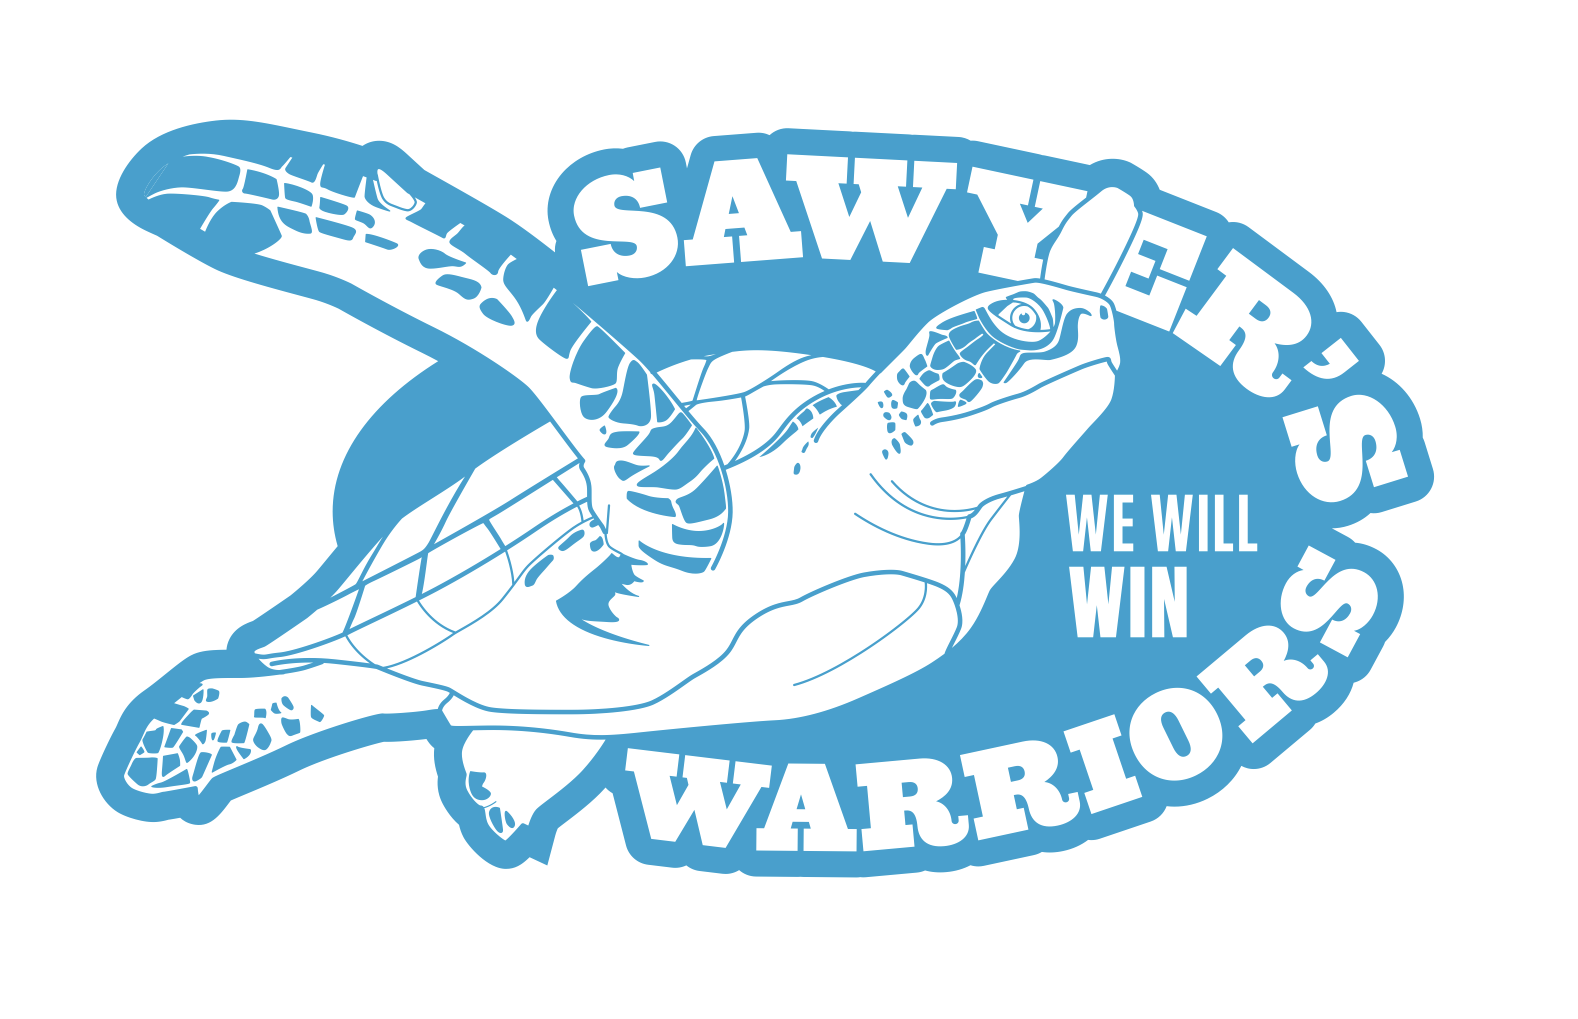 sawyerswarriors.png